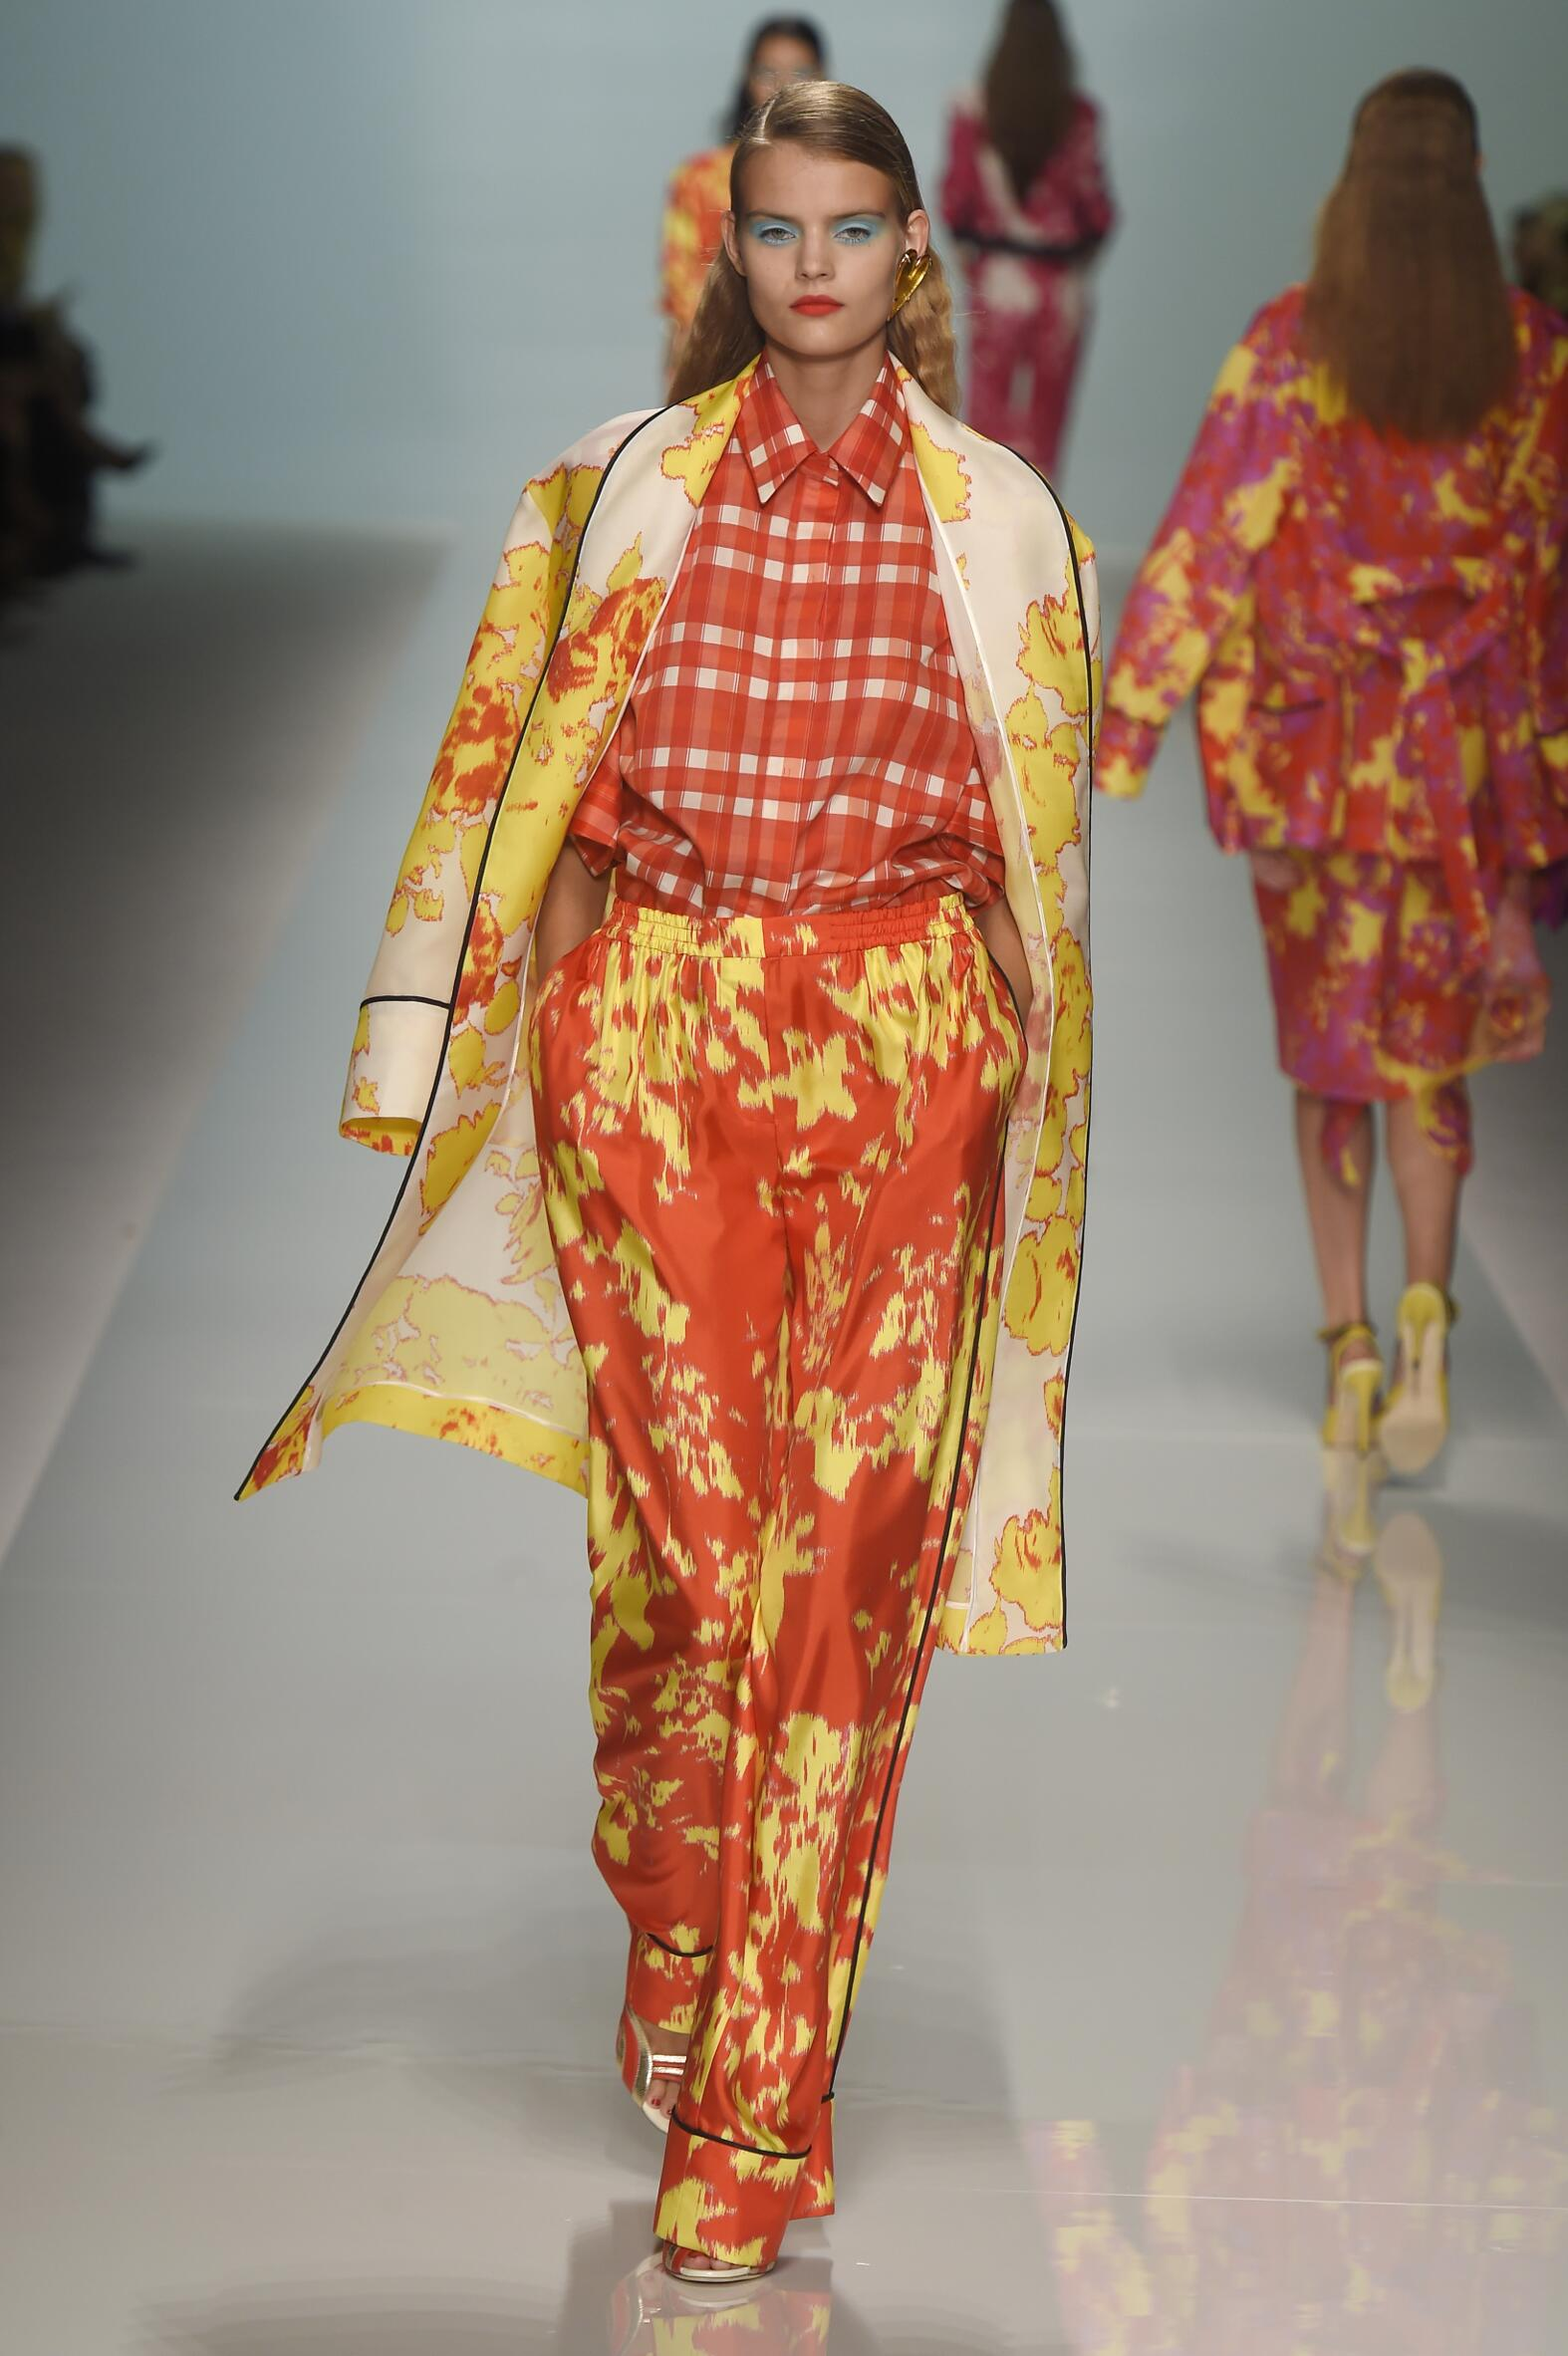 Catwalk Emanuel Ungaro Woman Fashion Show Summer 2015